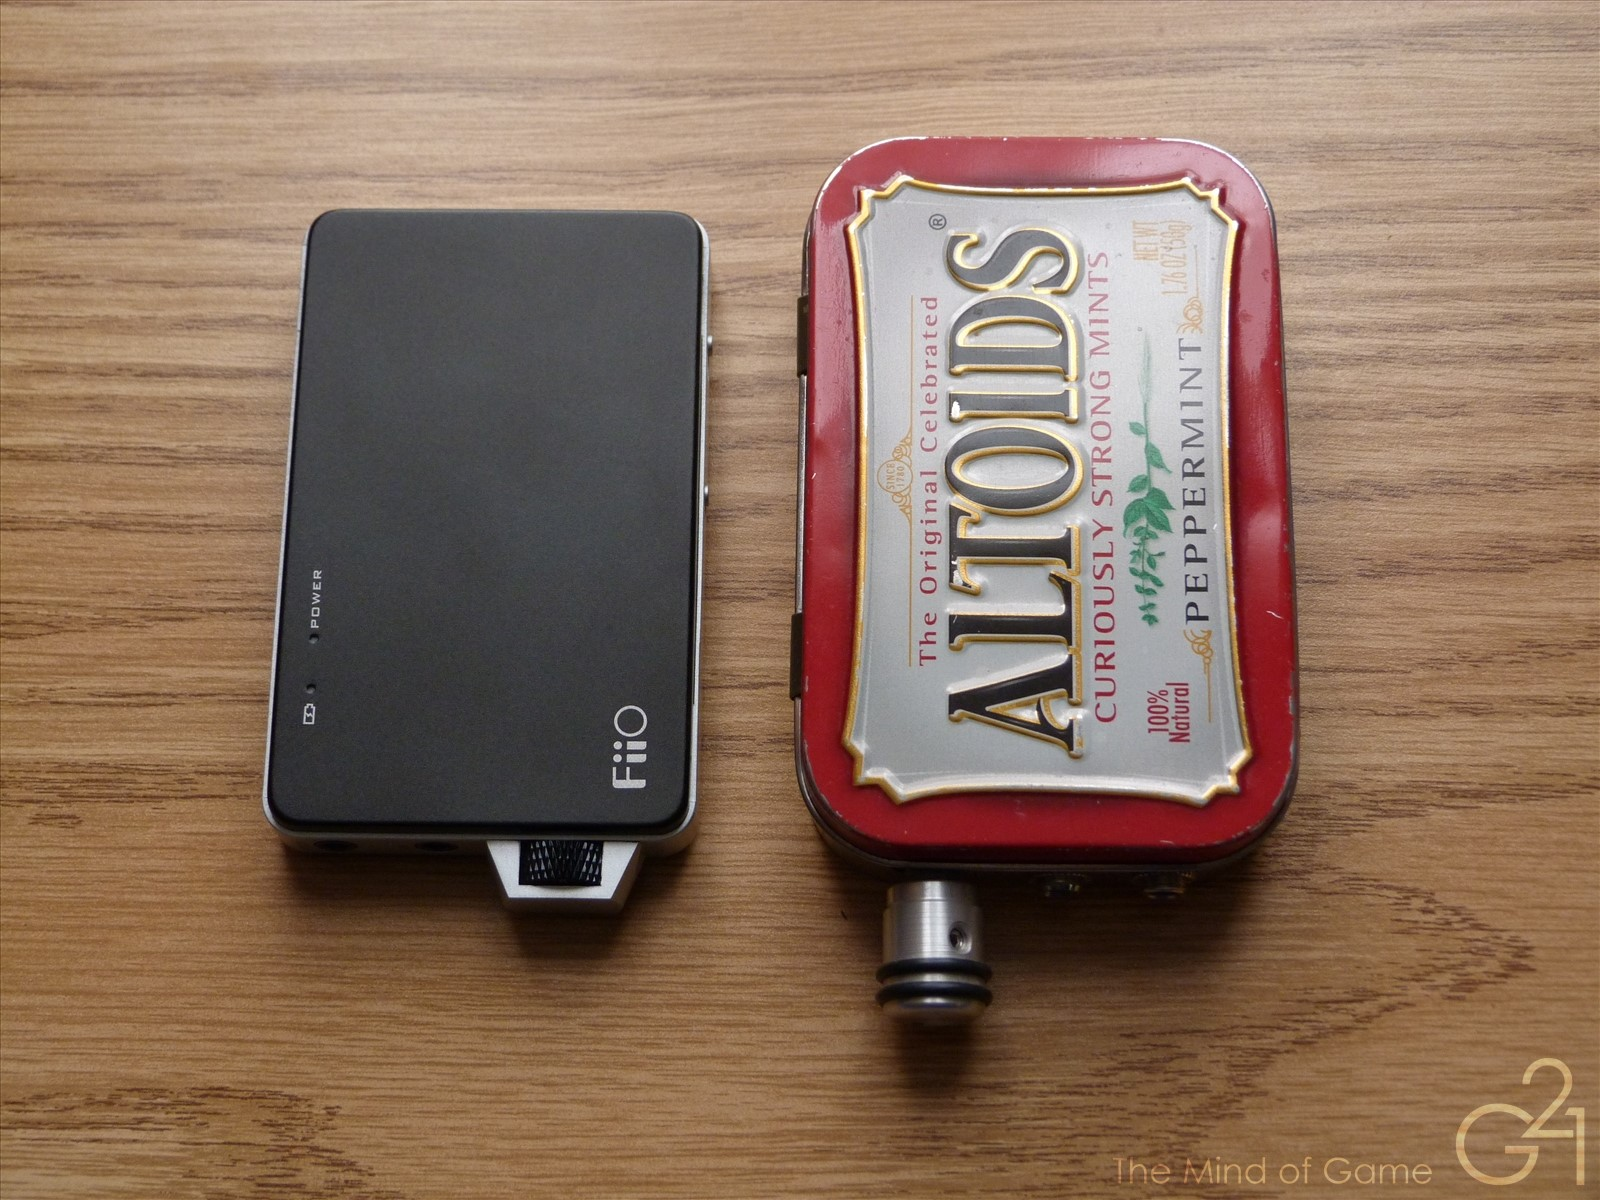 Amplifier Round Up Part 3 Fiio E11 Musical Musings Cmoy Headphone 9